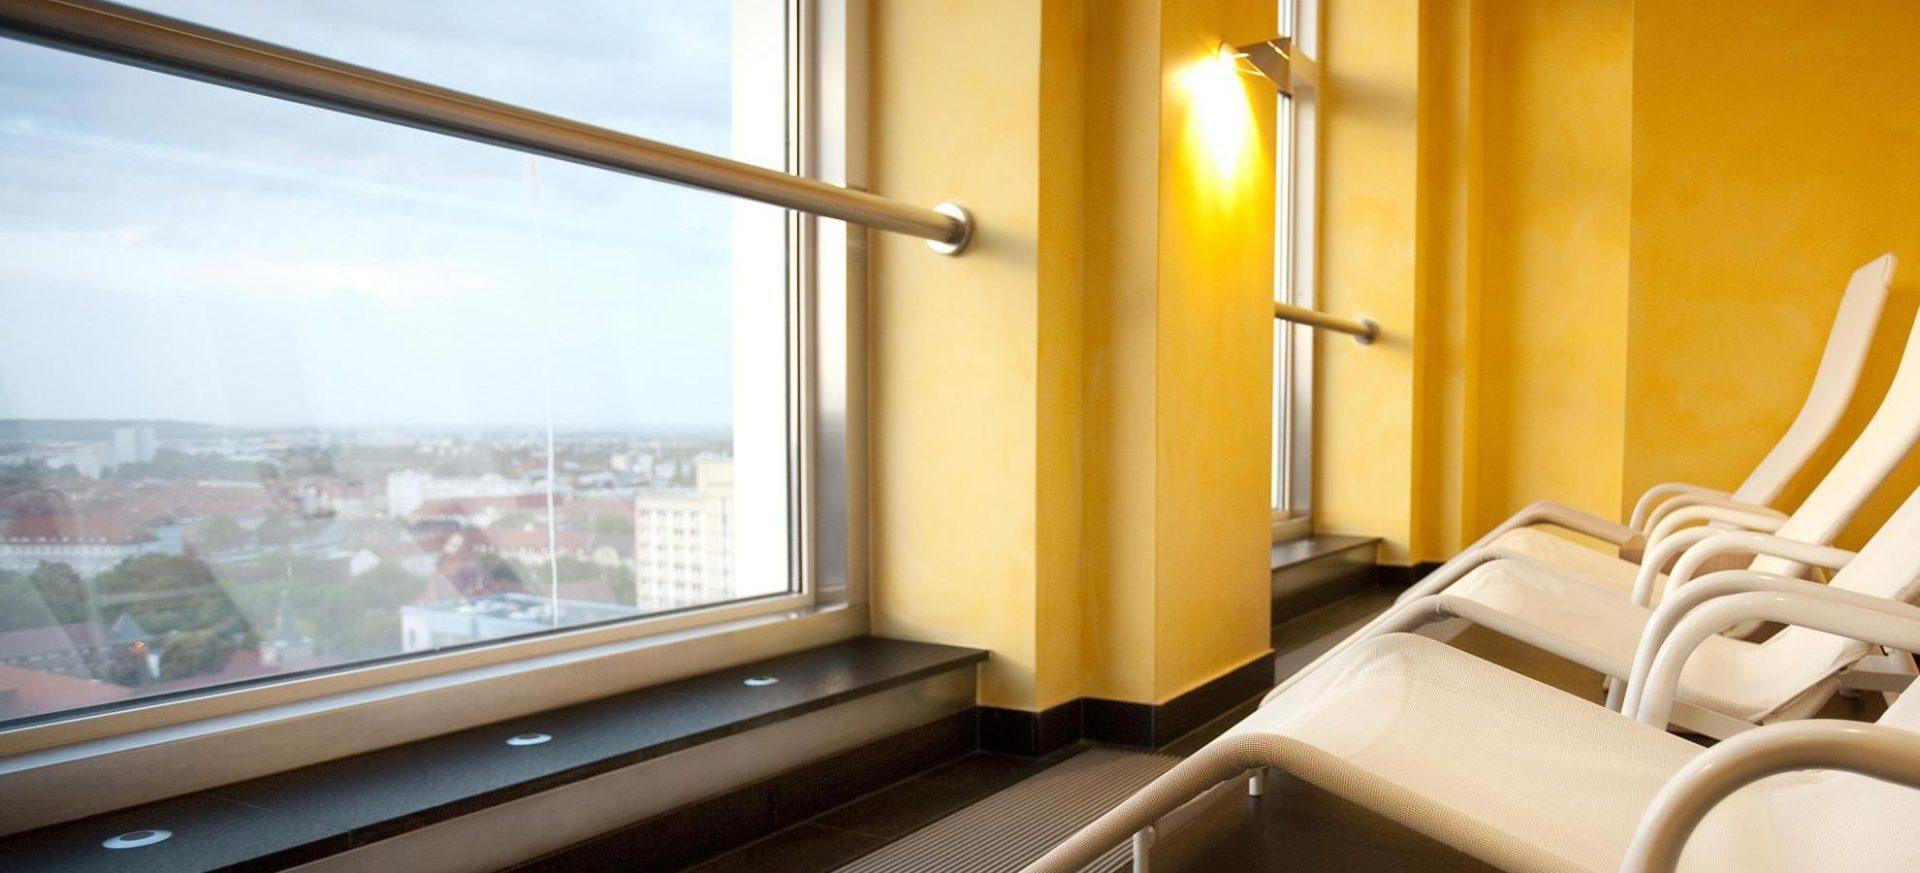 Radisson Blu Hotel Erfurt Wellness